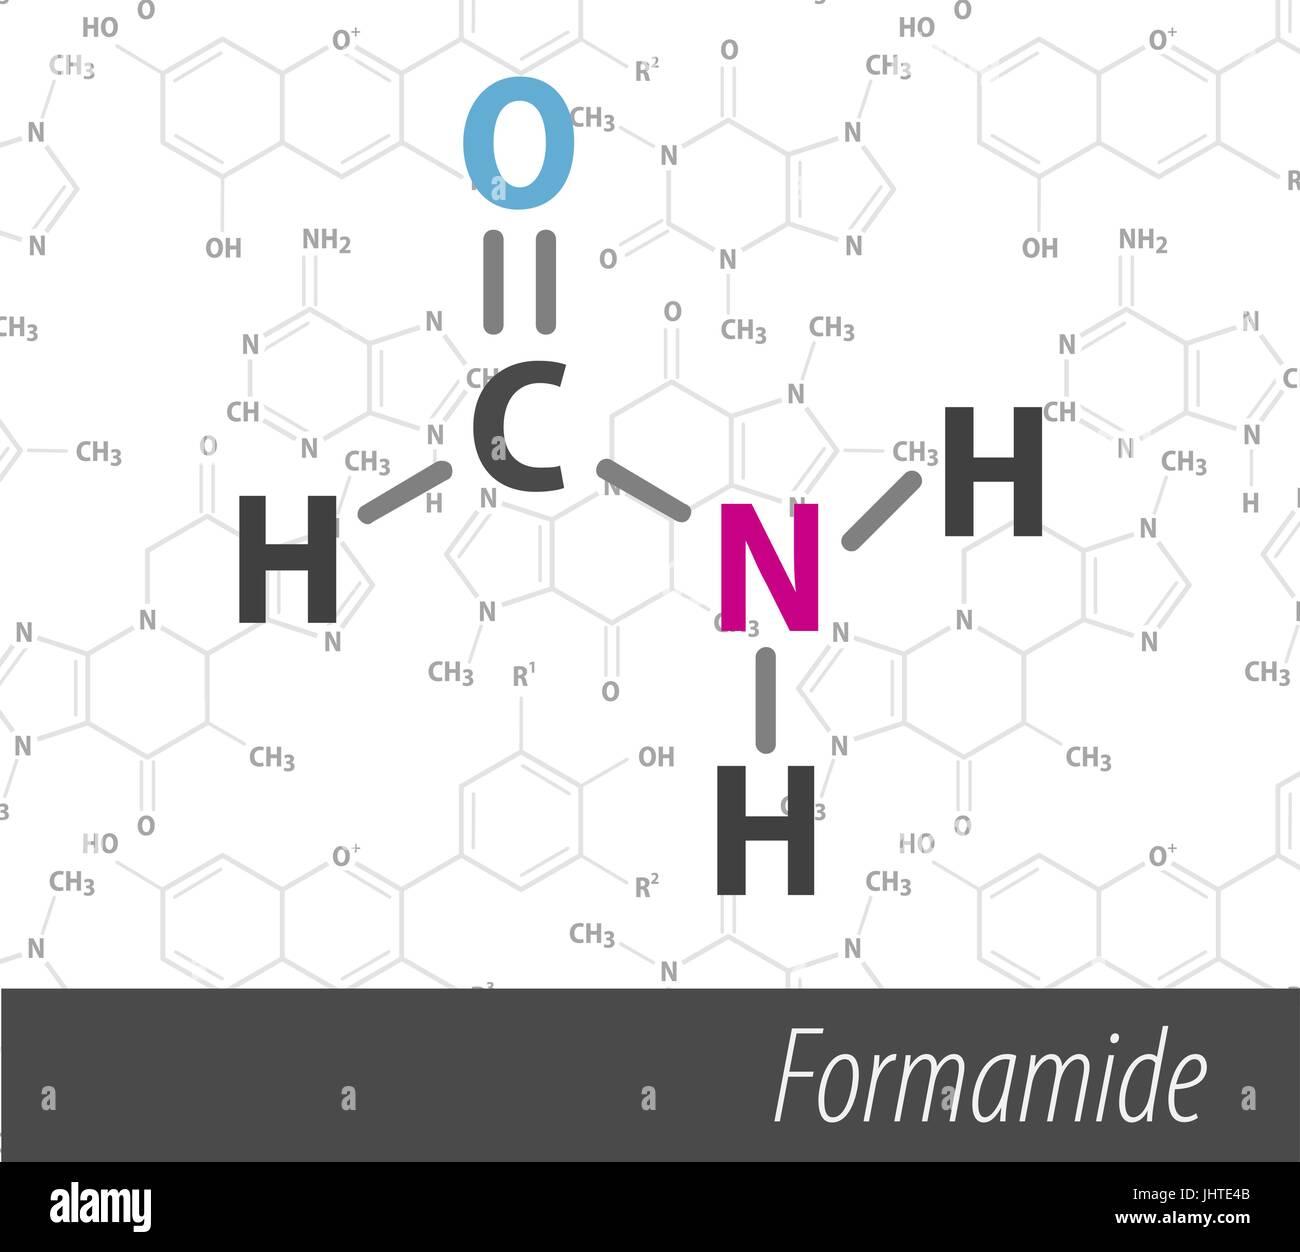 Set of chemistri orgnick formulas - Stock Image